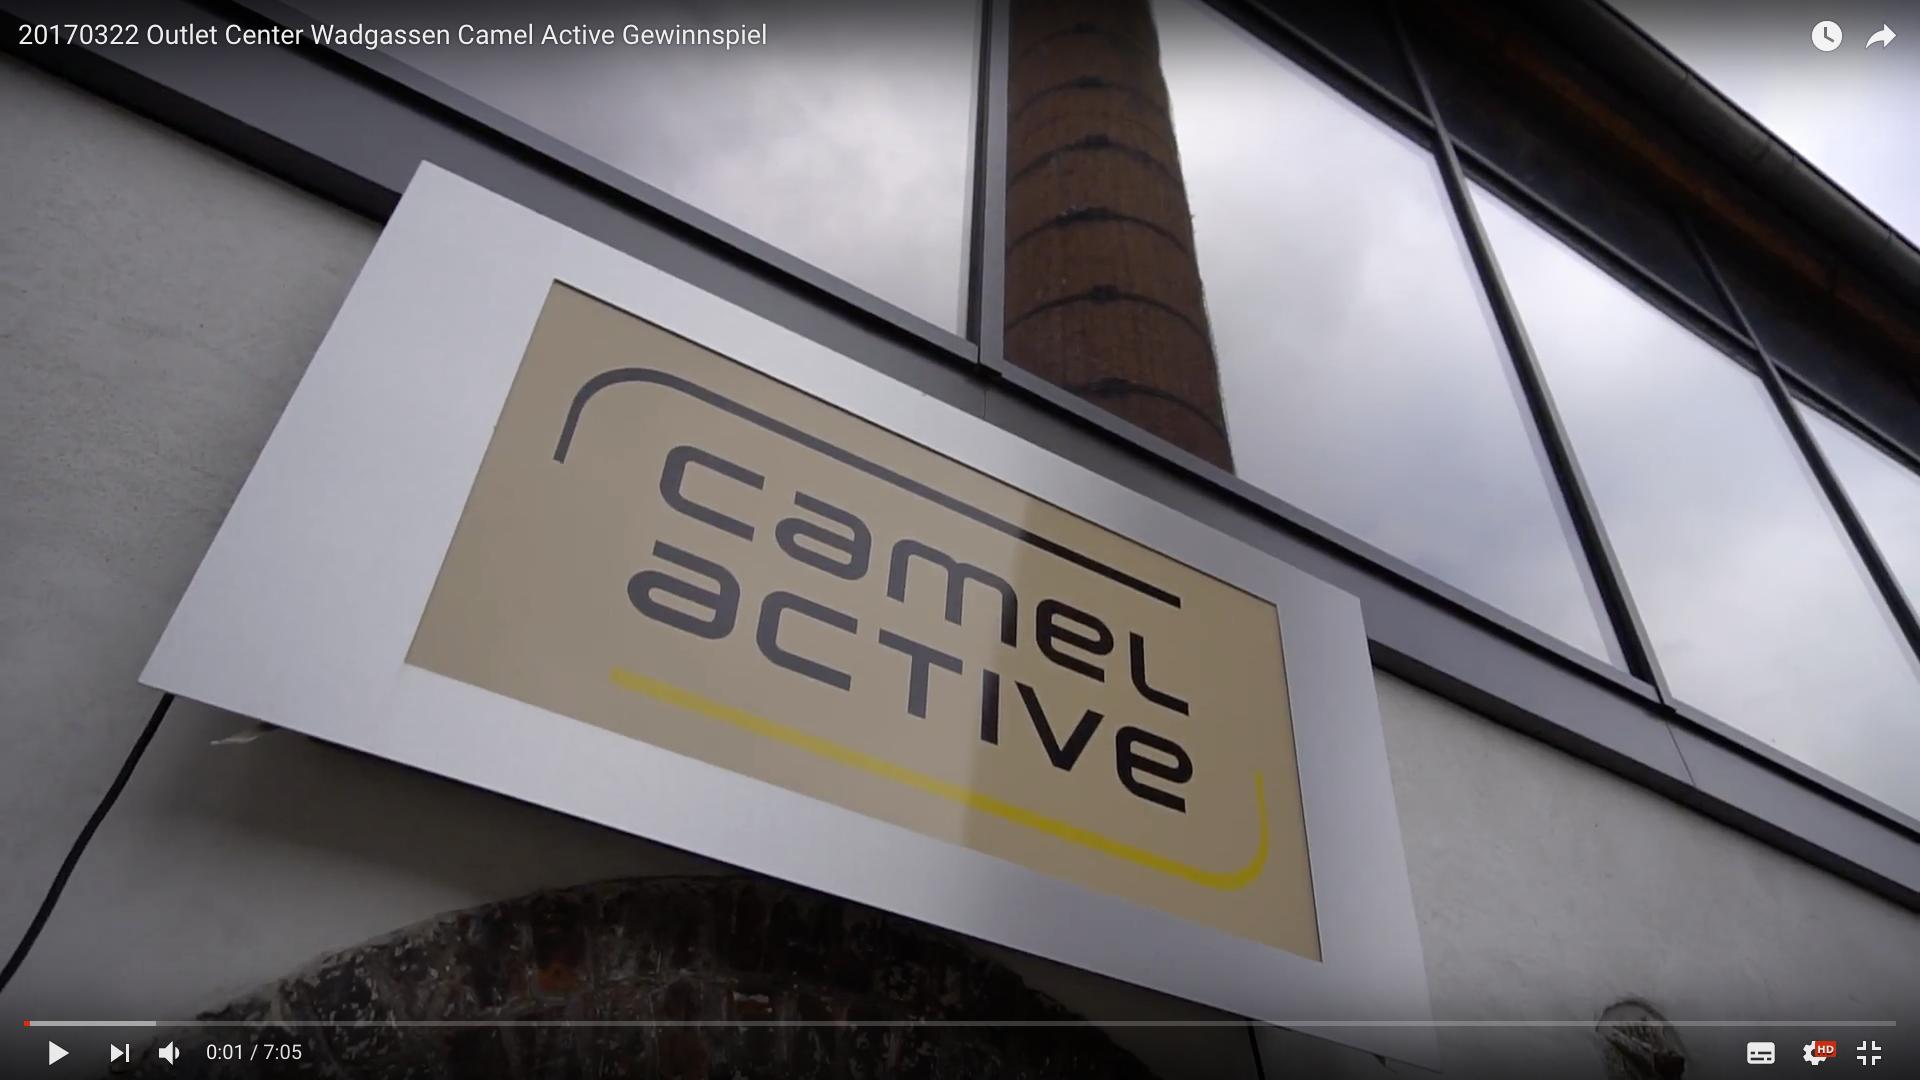 2017 Outlet Center Wadgassen Camel Active Gewinnspiel Camel Active _MSM_MEDIEN_SAAR_MOSEL_SAARLAND_FERNSEHEN_1_ED_SAAR